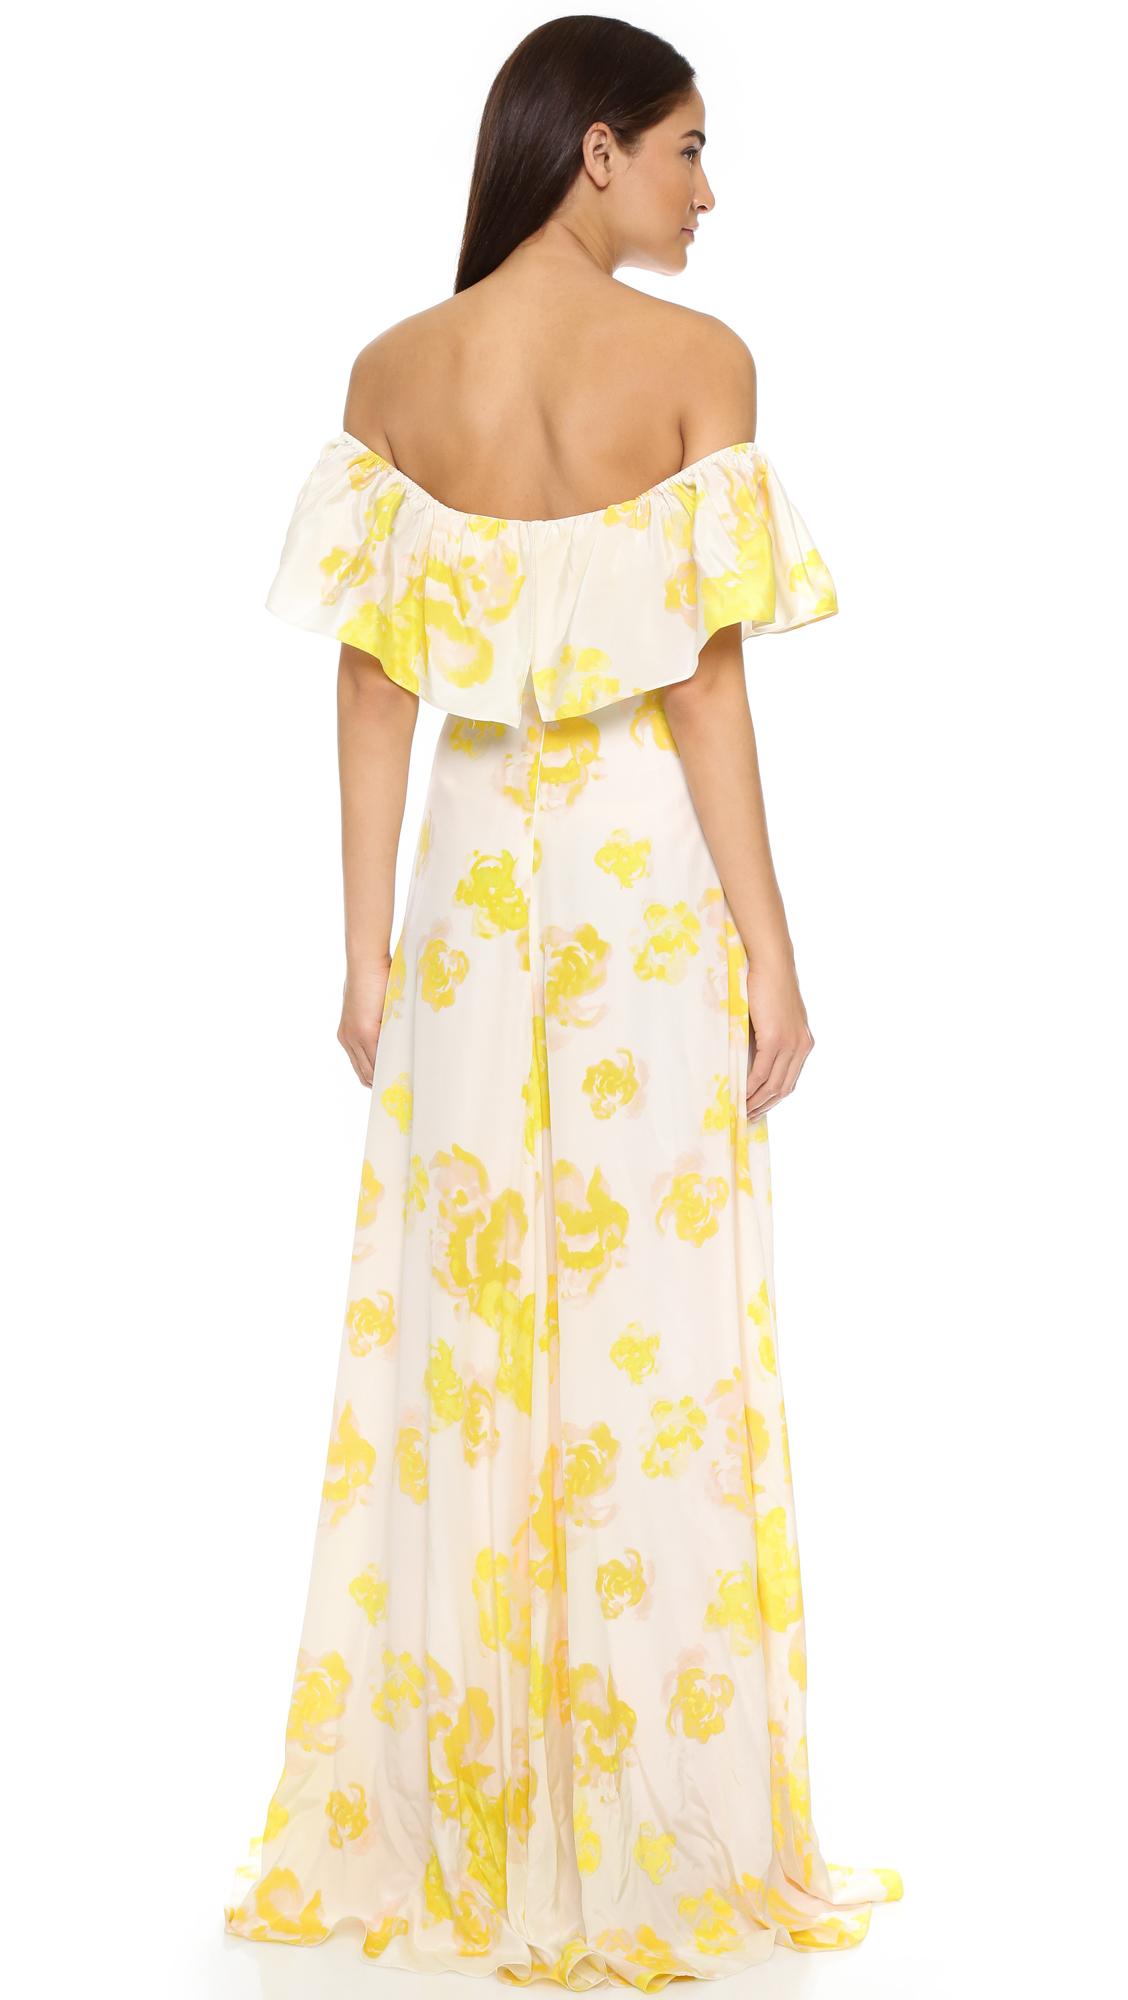 633fd47126 Lyst - Amanda Uprichard Delilah Dress in Yellow